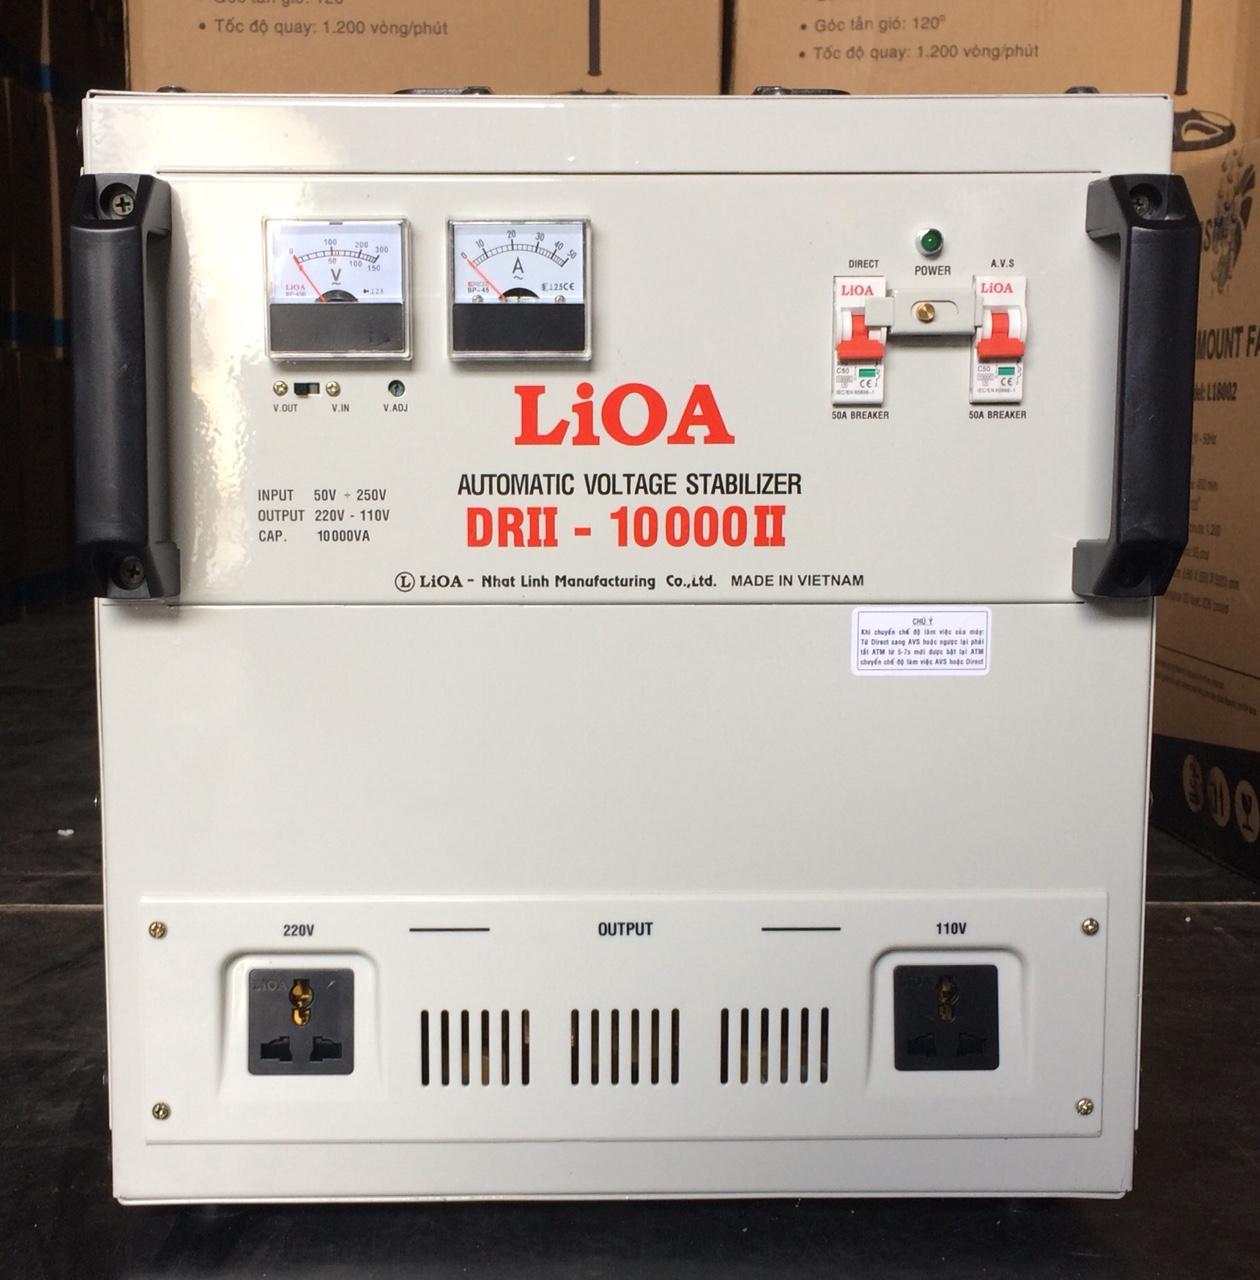 Ổn Áp LiOA 1 Pha DRII 10KVA NEW 2020 (50-250v) - Đồng hồ điện tử